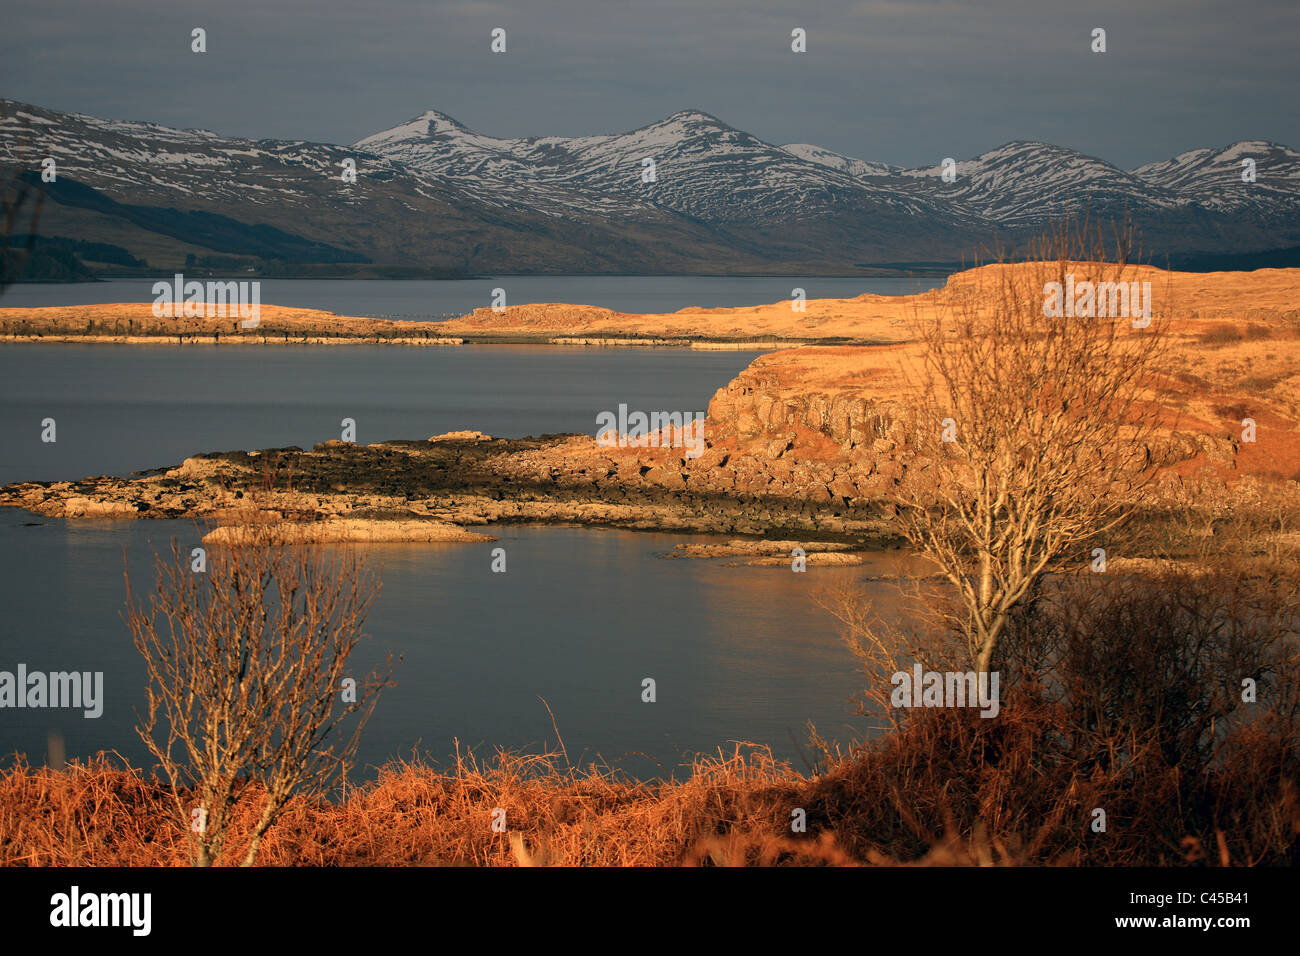 Winter sunshine over Loch Scridain on the Isle of Mull - Stock Image